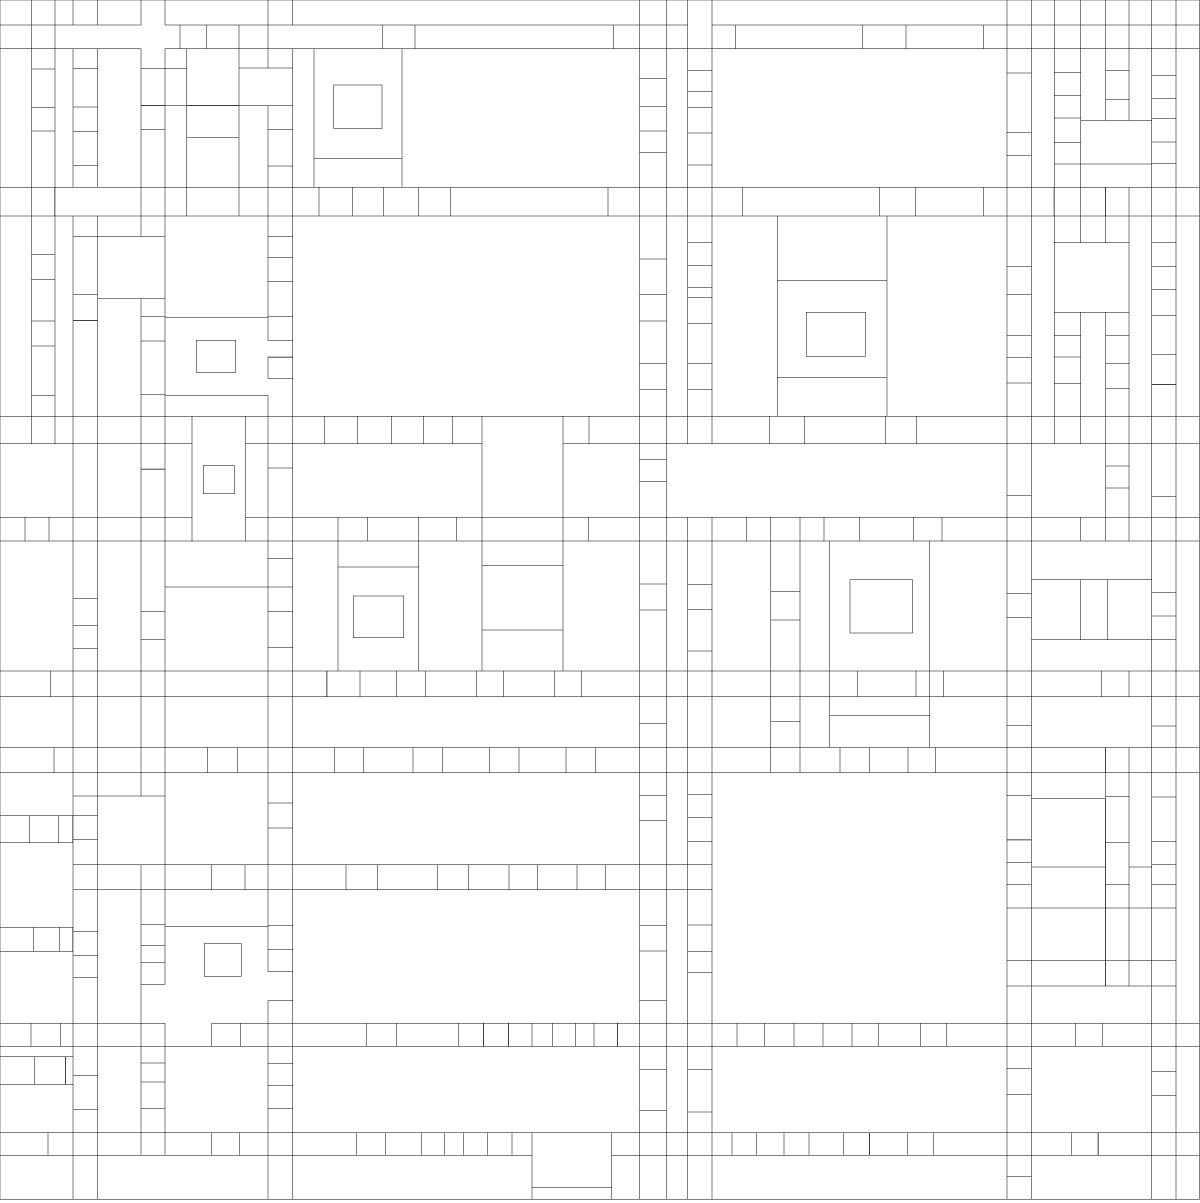 Hello Kitty Broadway Boogie Woogie (Remix) - Structure